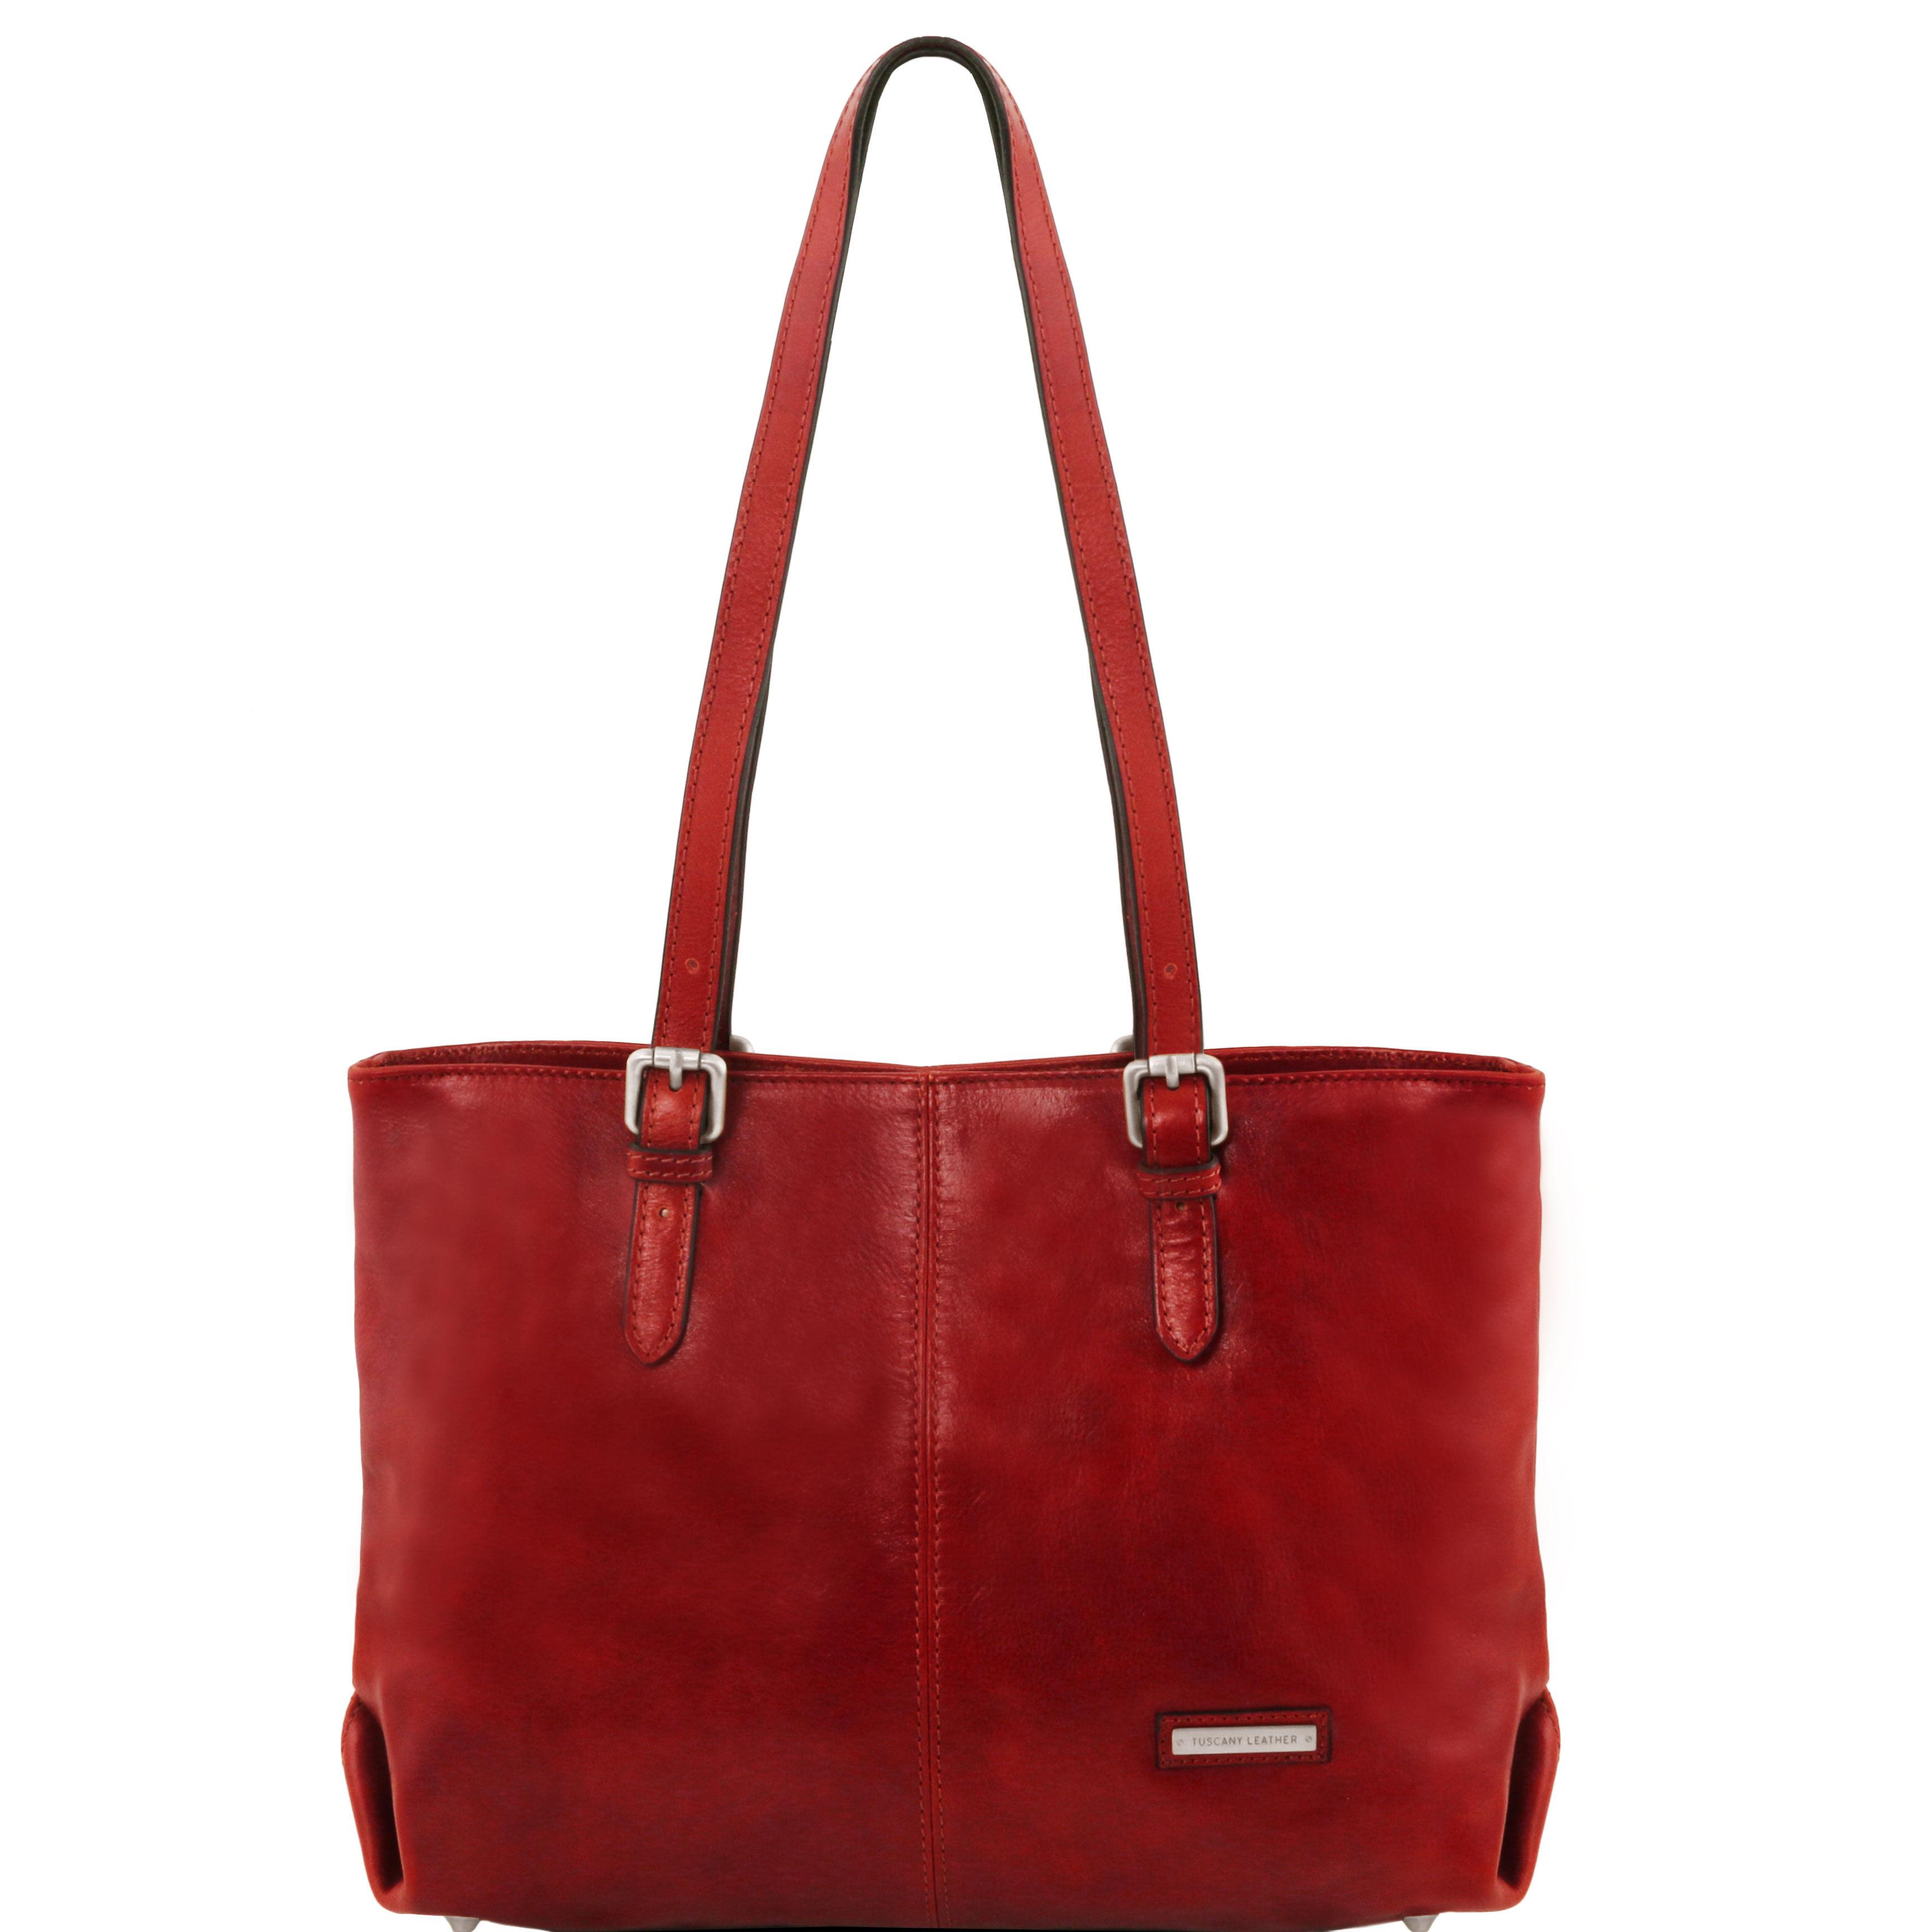 ANNALISA - Geanta shopper din piele rosie